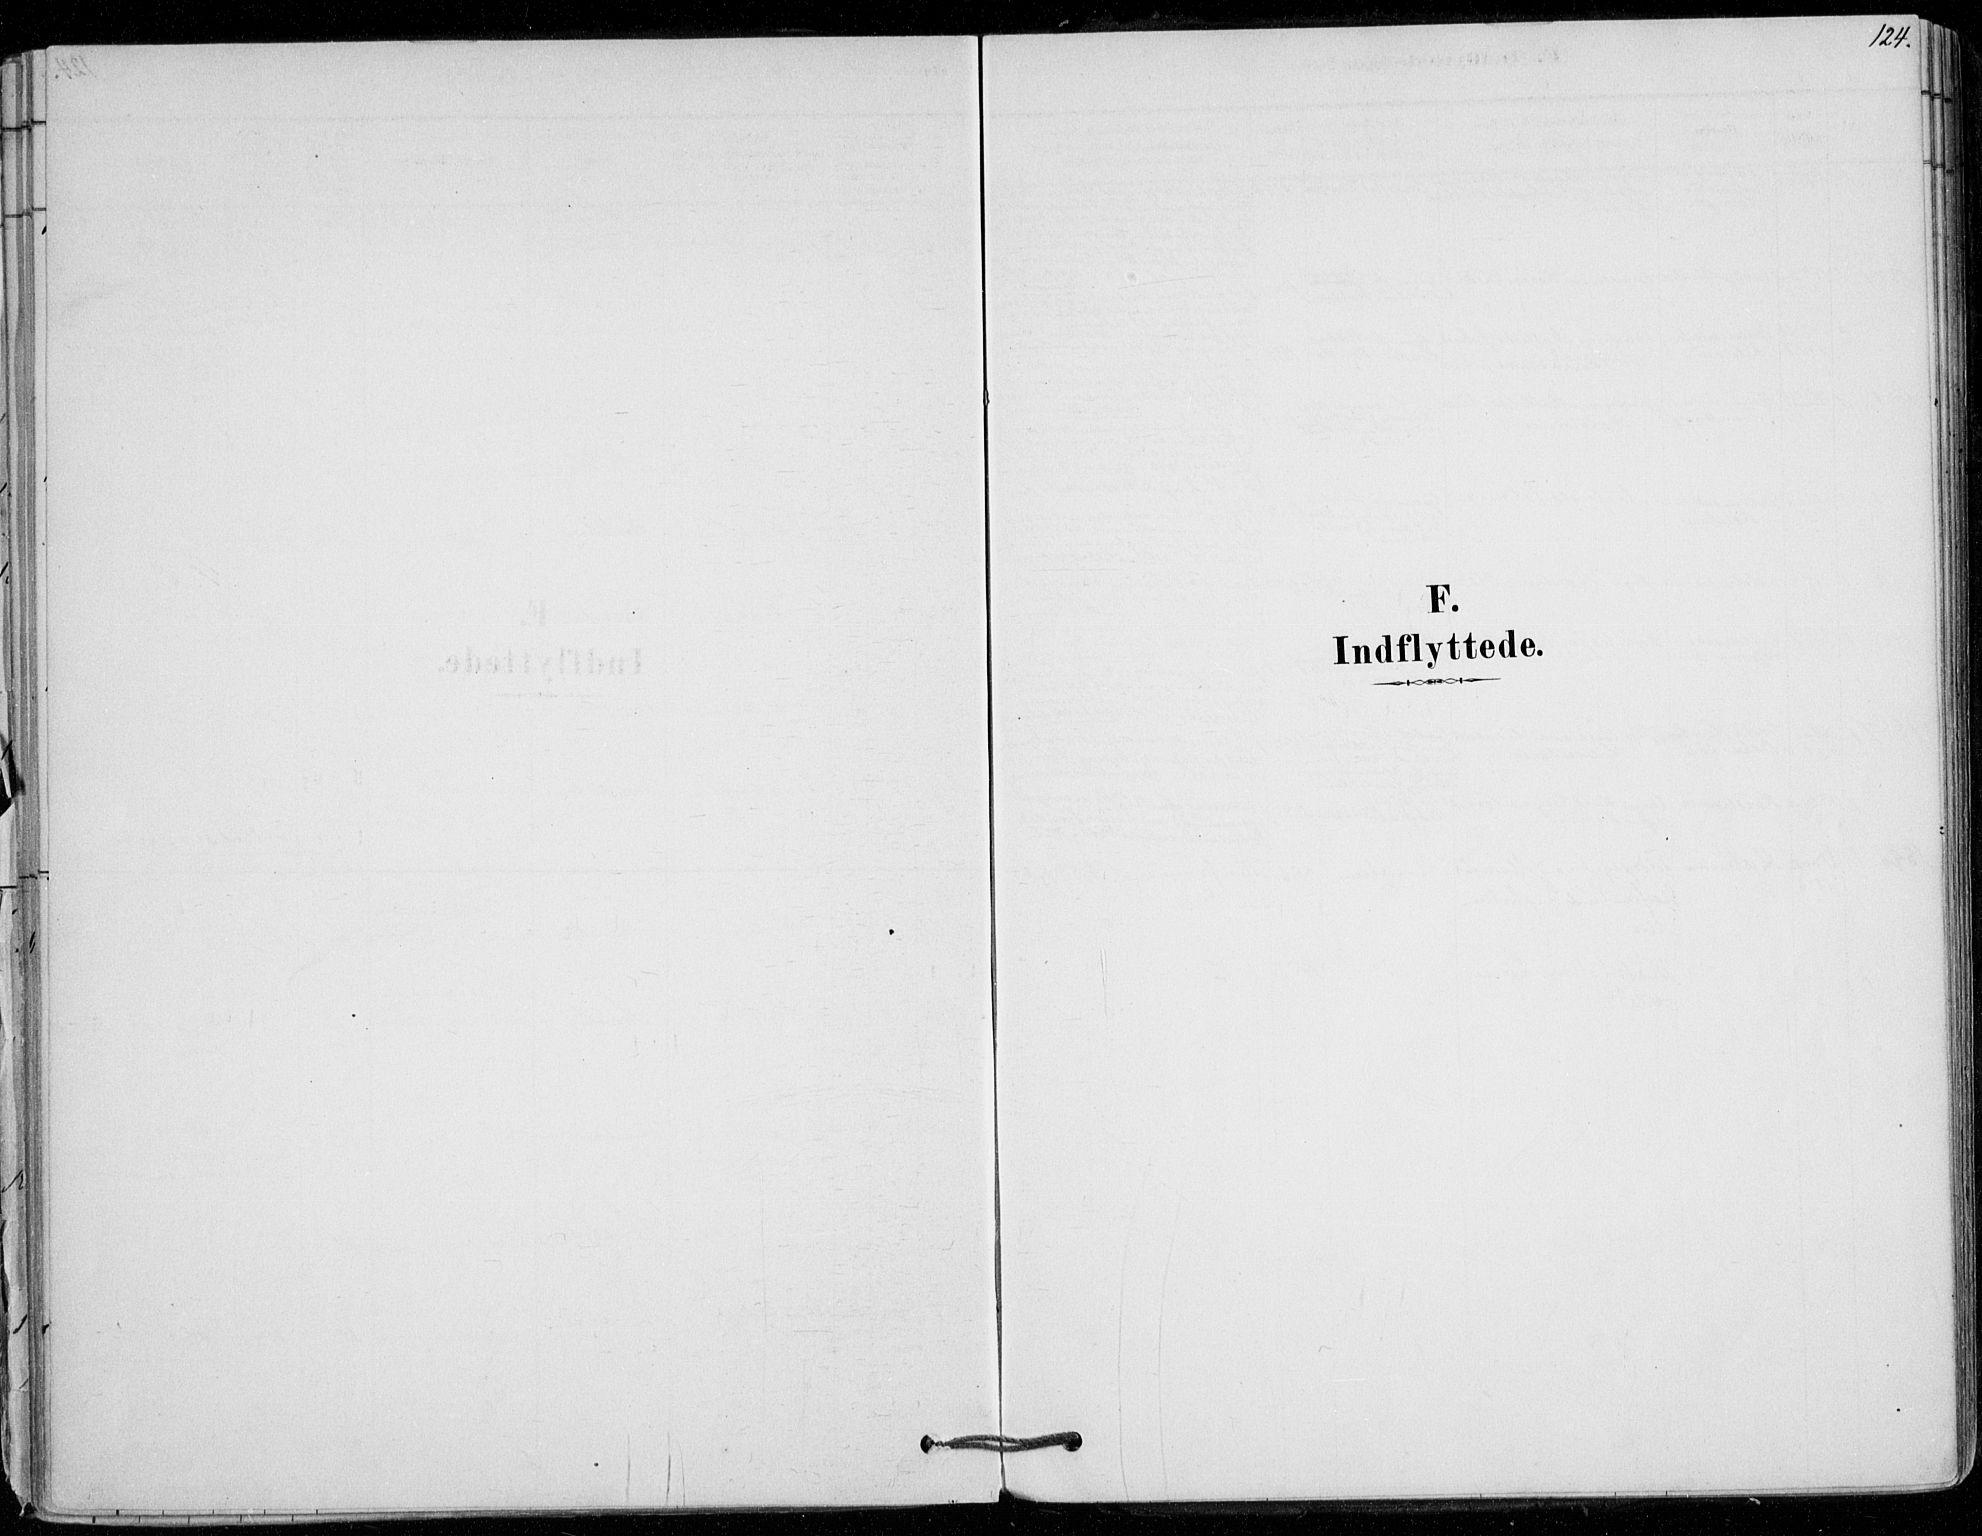 SAO, Vestby prestekontor Kirkebøker, F/Fd/L0001: Ministerialbok nr. IV 1, 1878-1945, s. 124